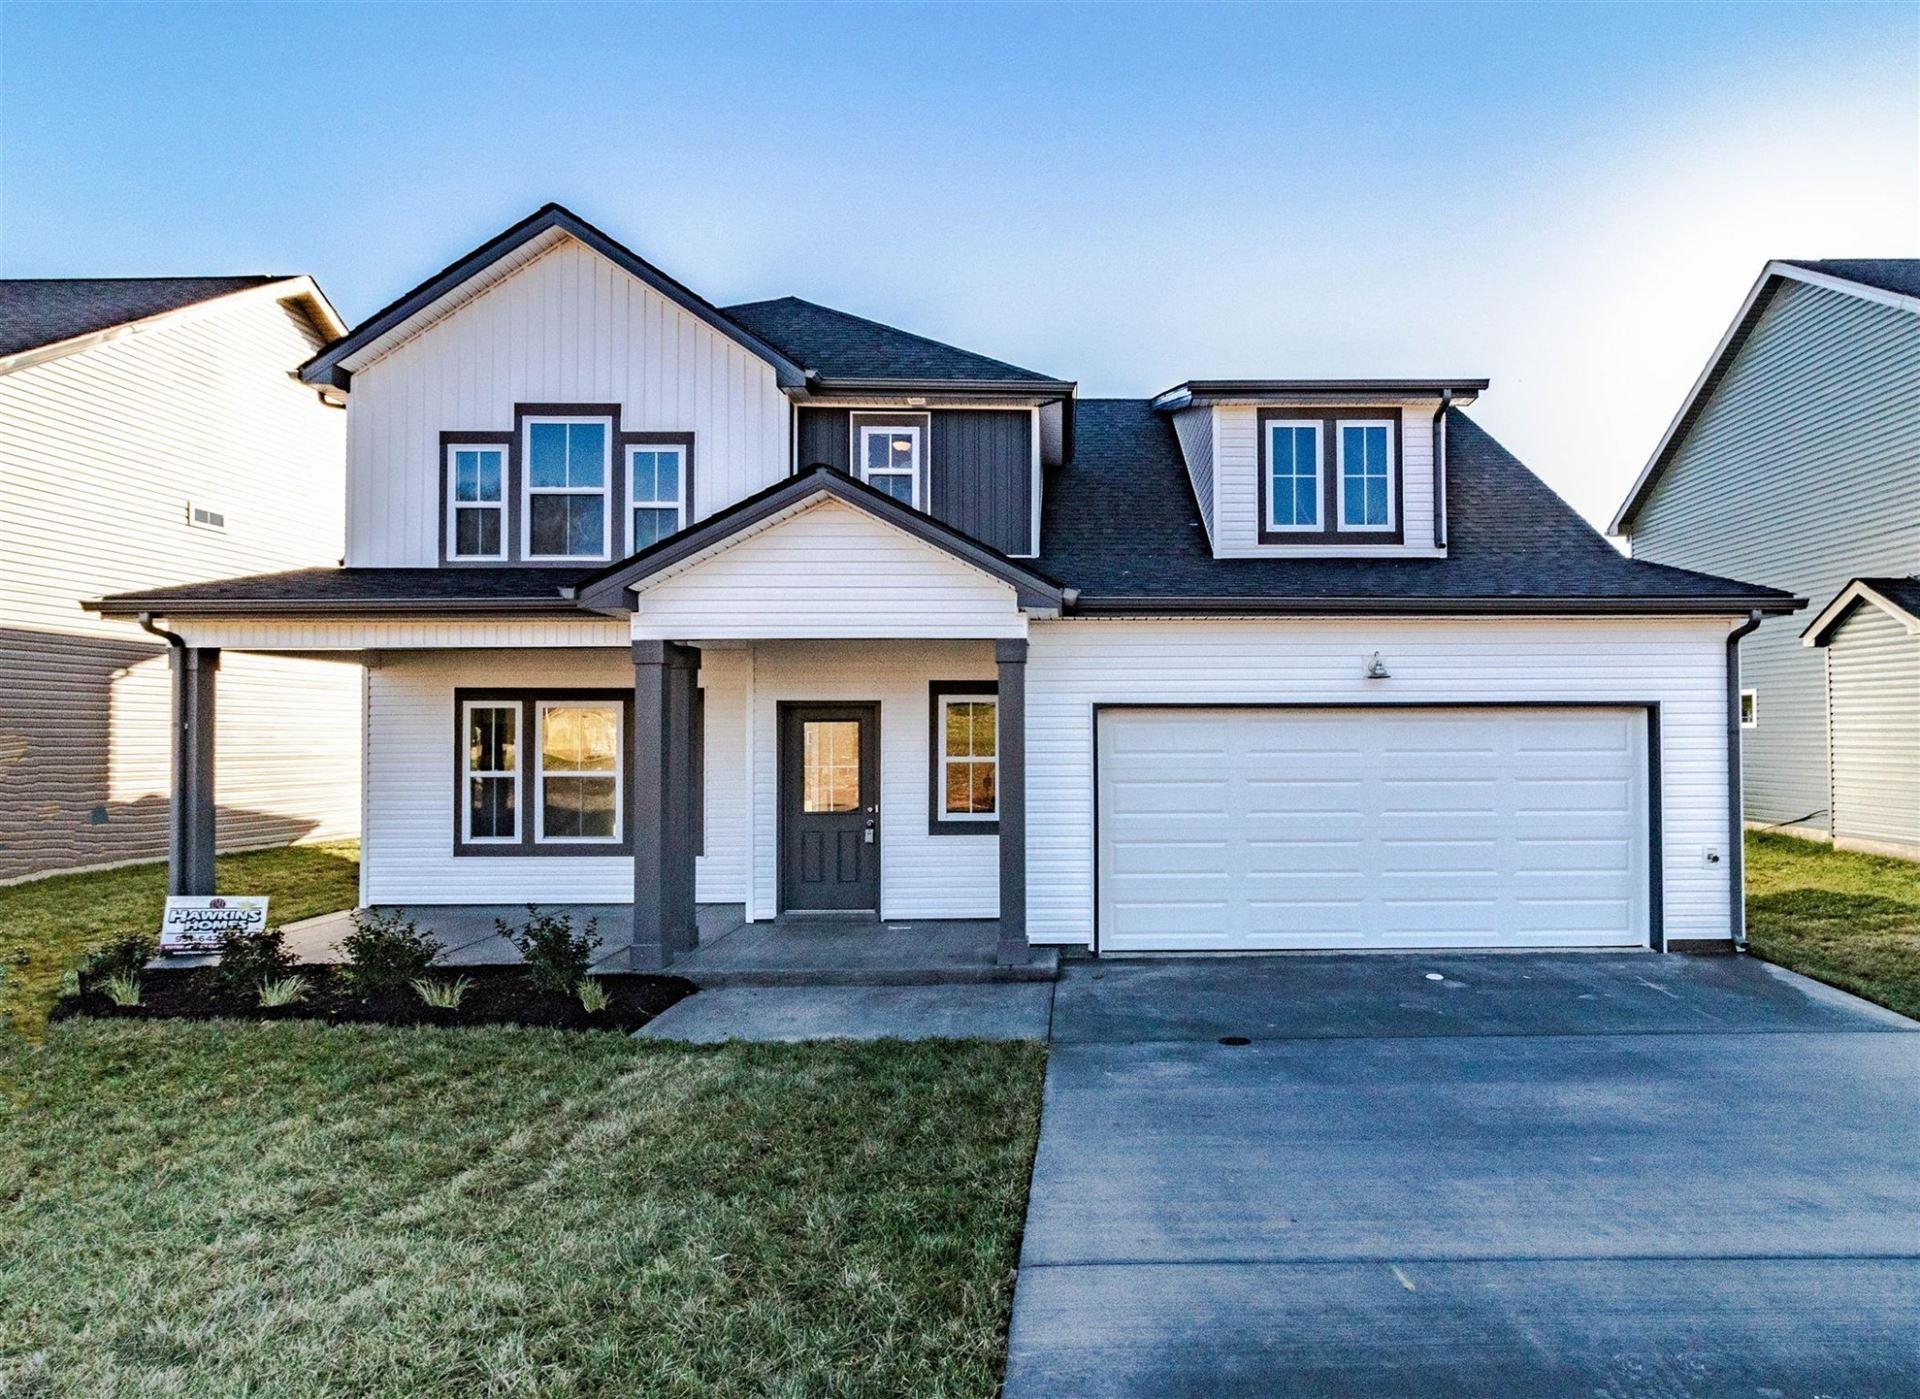 141 Mills Creek, Clarksville, TN 37042 - MLS#: 2282425